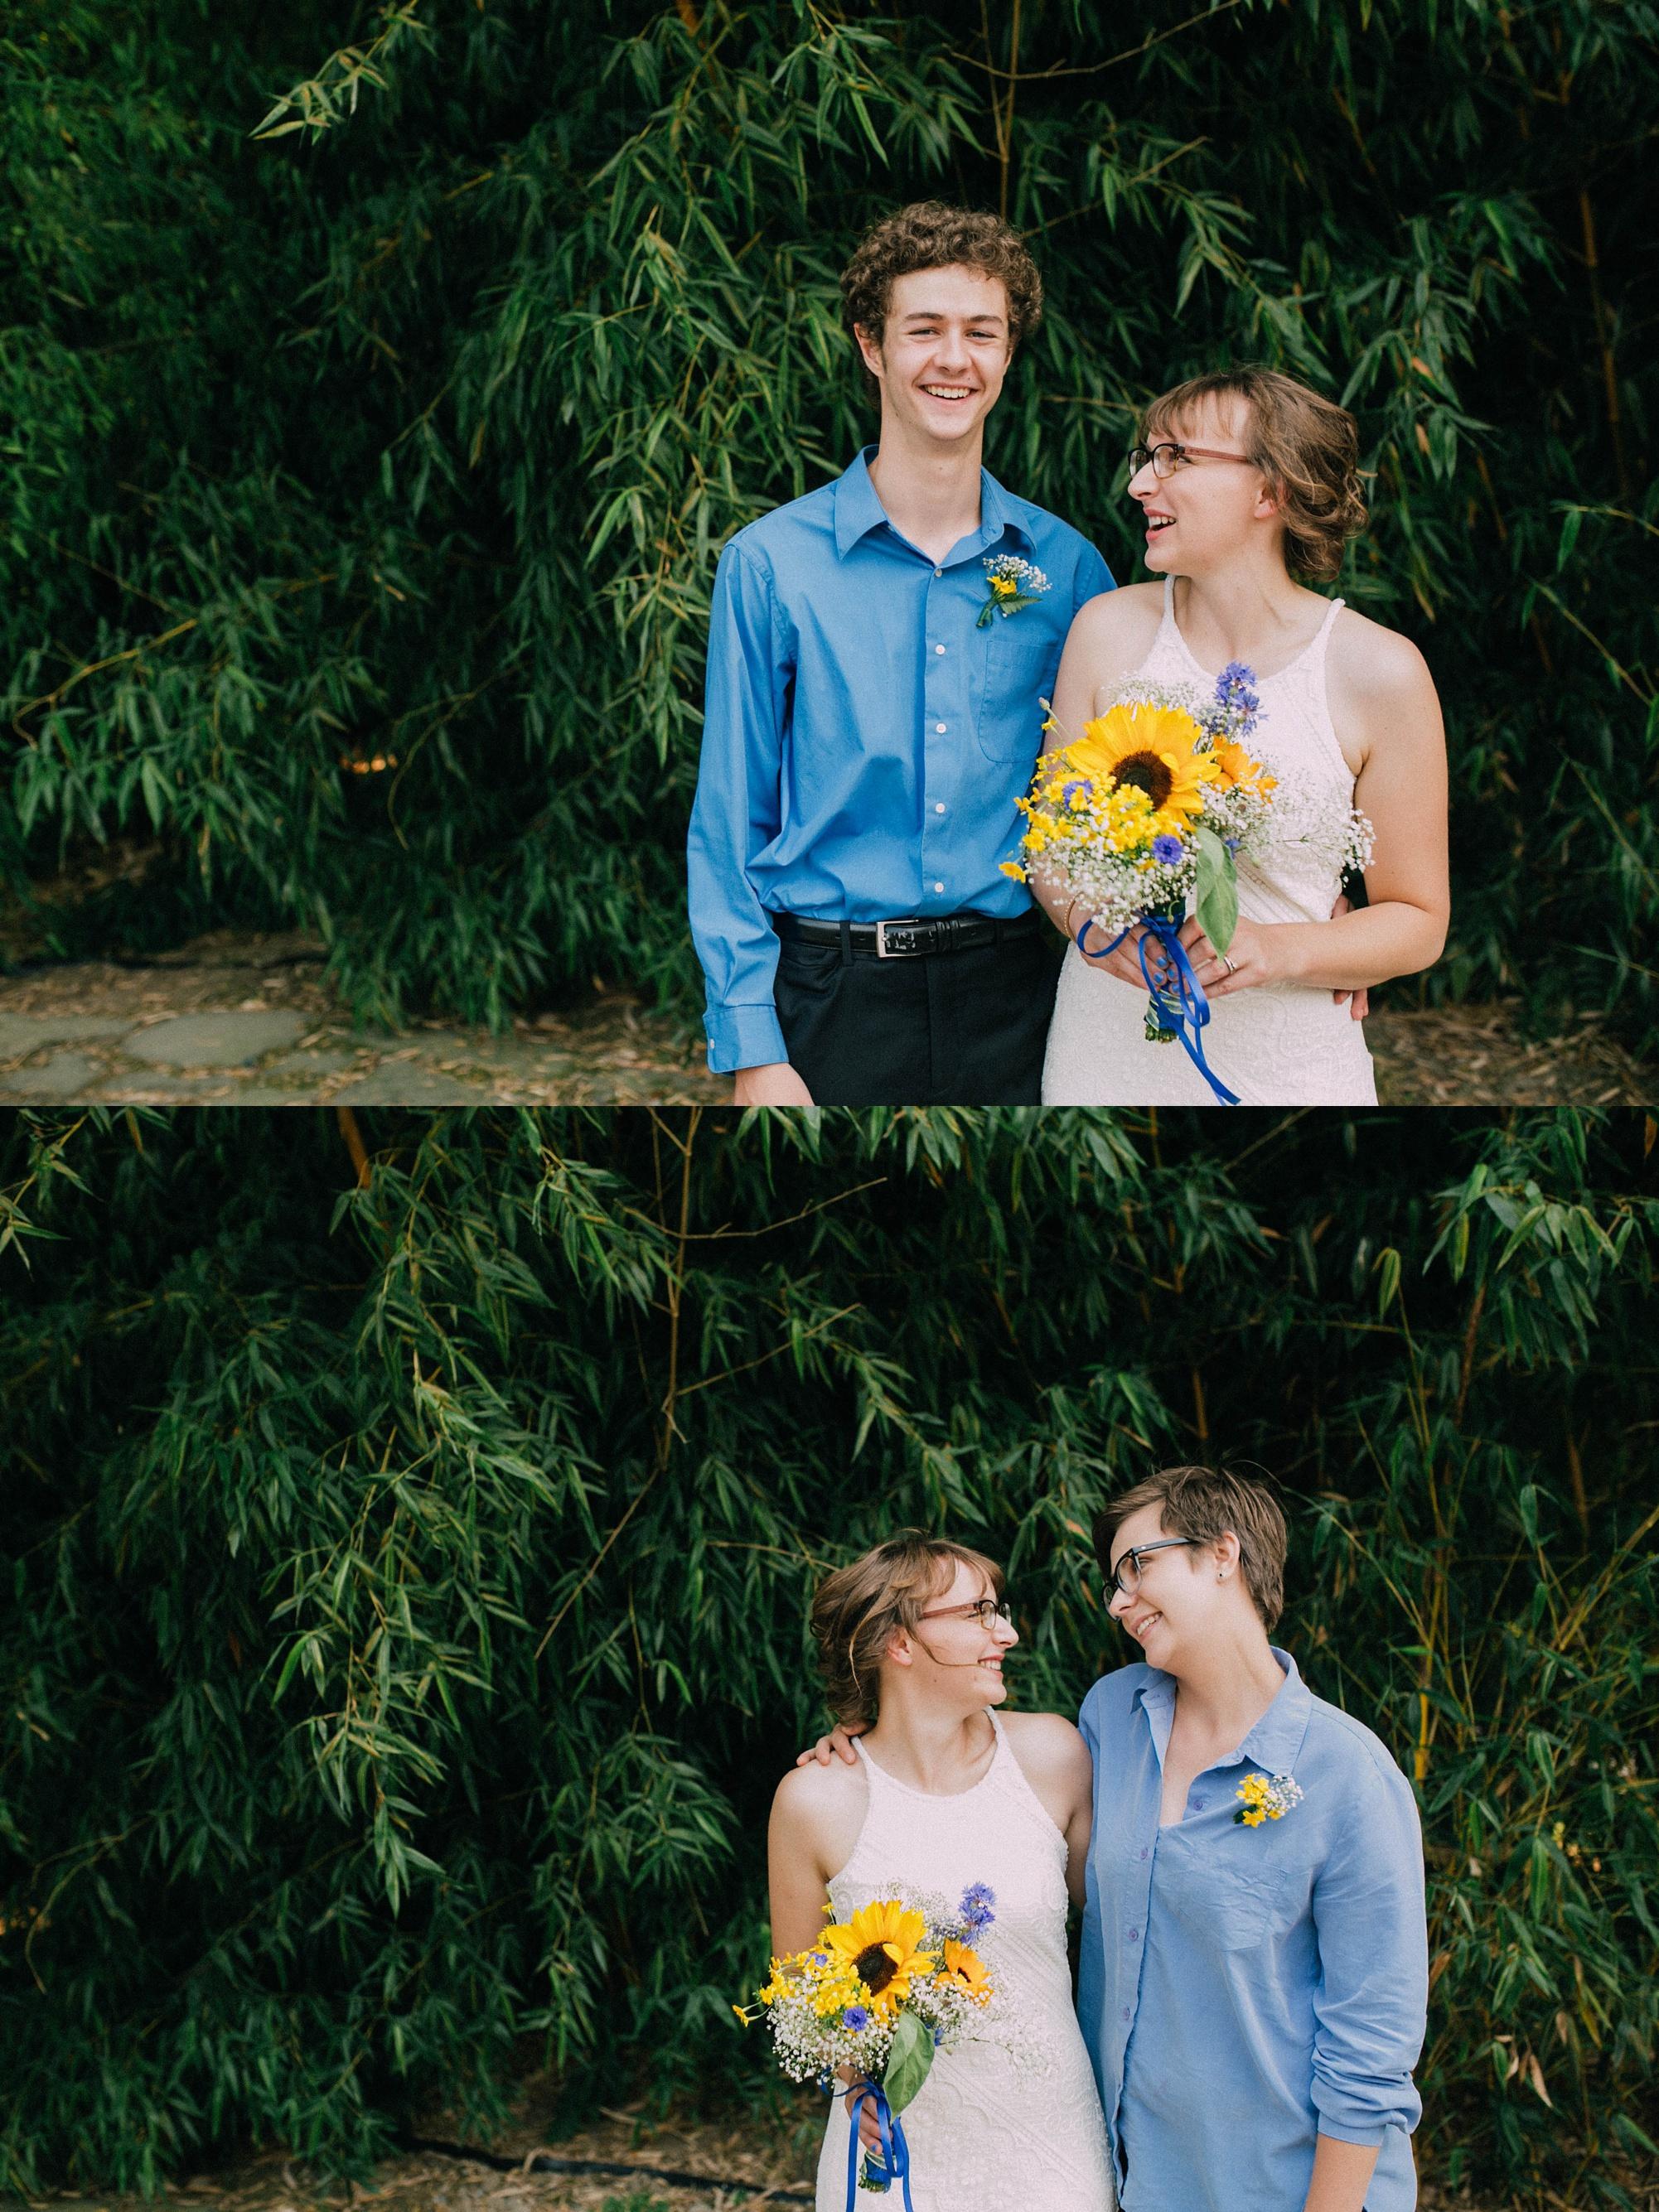 ashley_vos_seattle_ wedding_photographer_0453.jpg